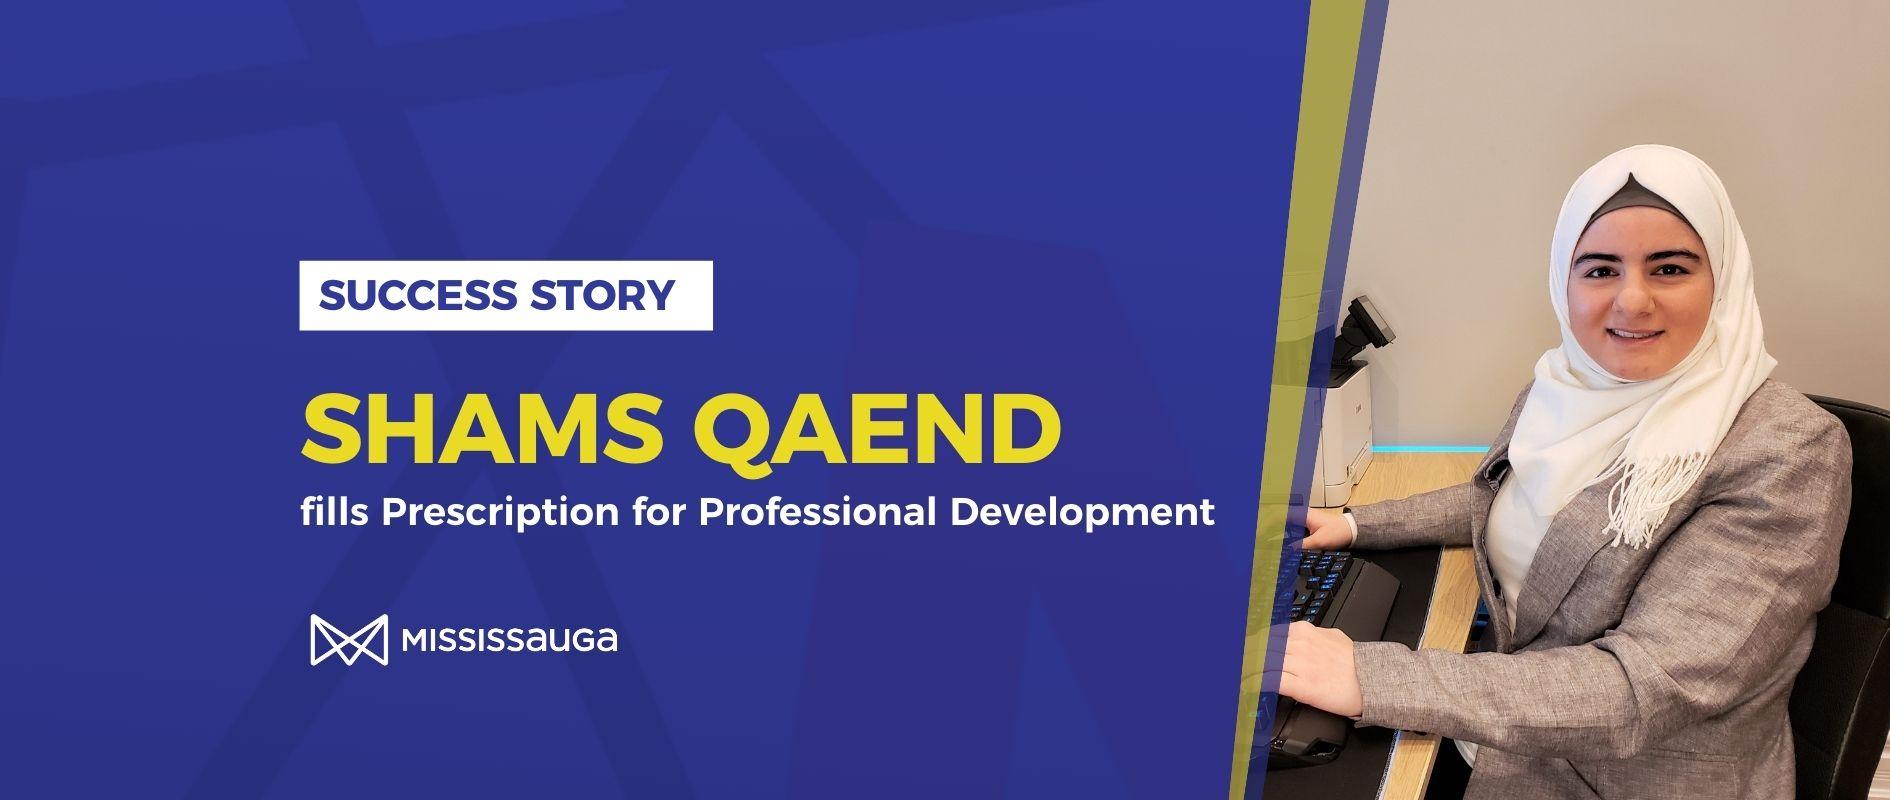 Shams Qaend fills Prescription for Professional Development